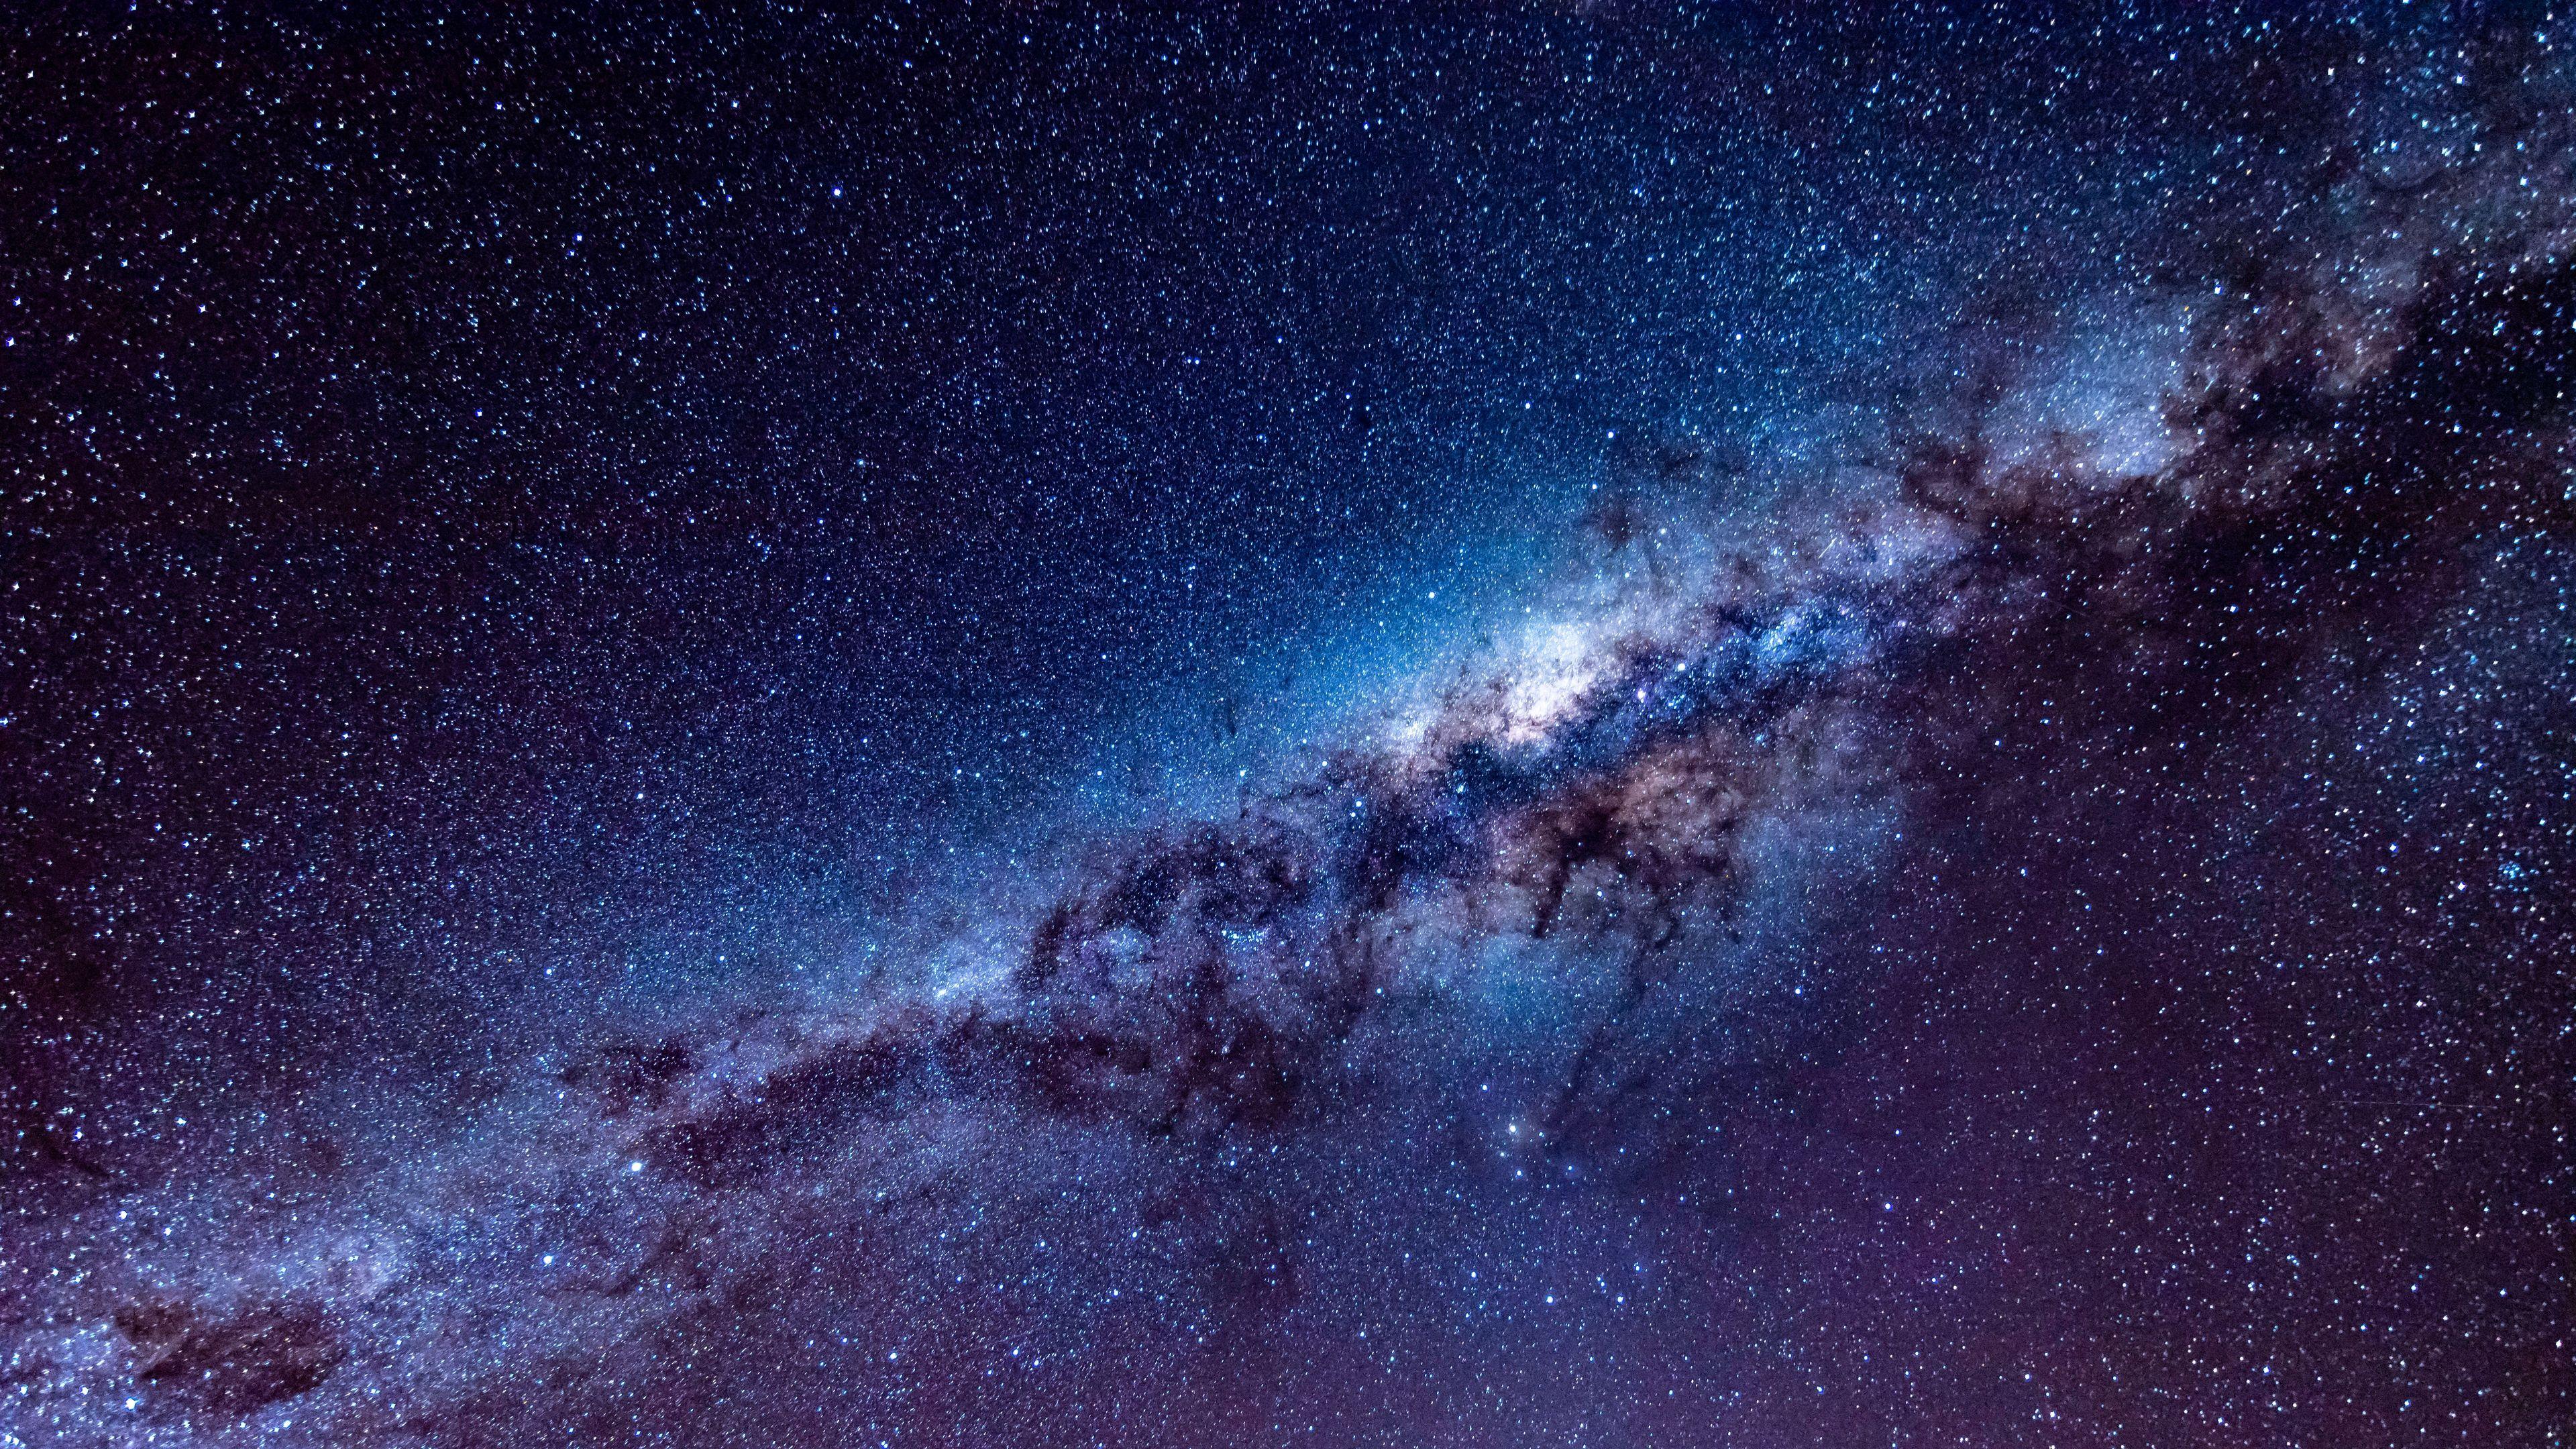 Milky Way Starry Sky 4k Wallpaper Galaxy Pictures Galaxy Wallpaper Milky Way Wallpaper milky way starry night nebula